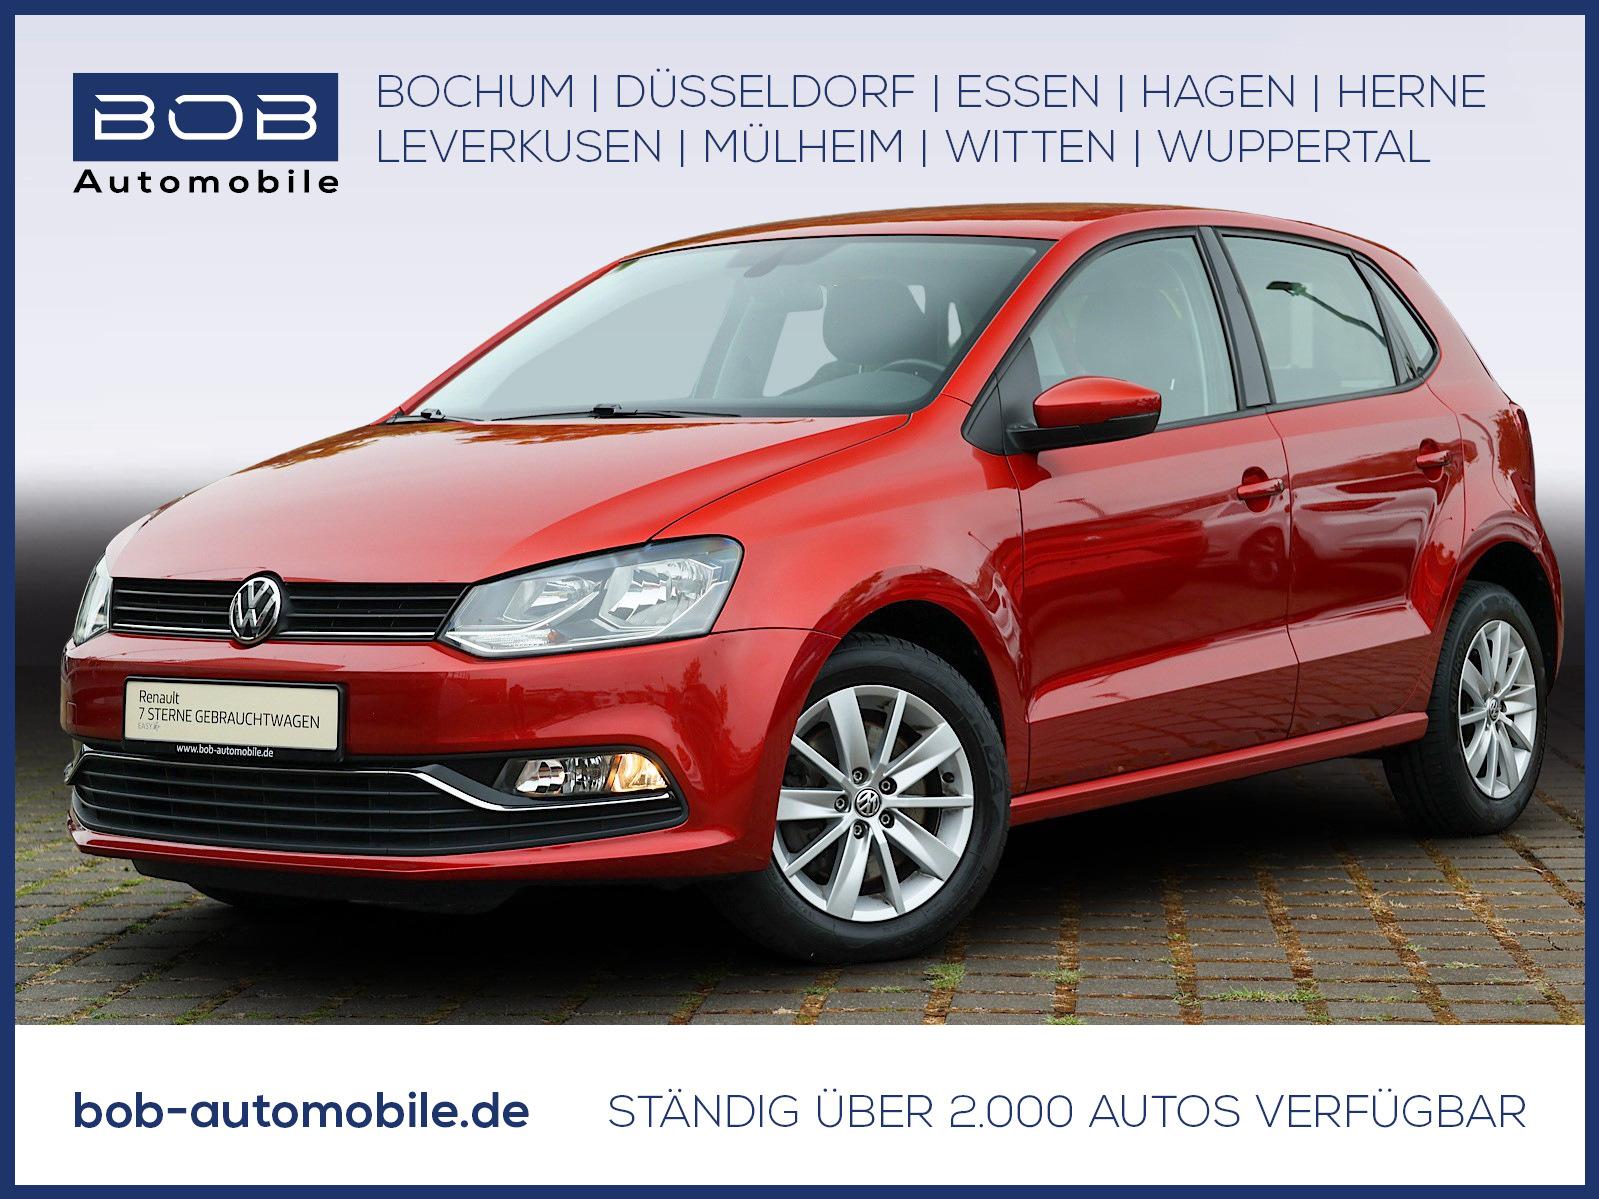 Volkswagen Polo 1.2 TSI Highline CLIMATRONIC+TOUCH+WKR+ALU, Jahr 2015, Benzin